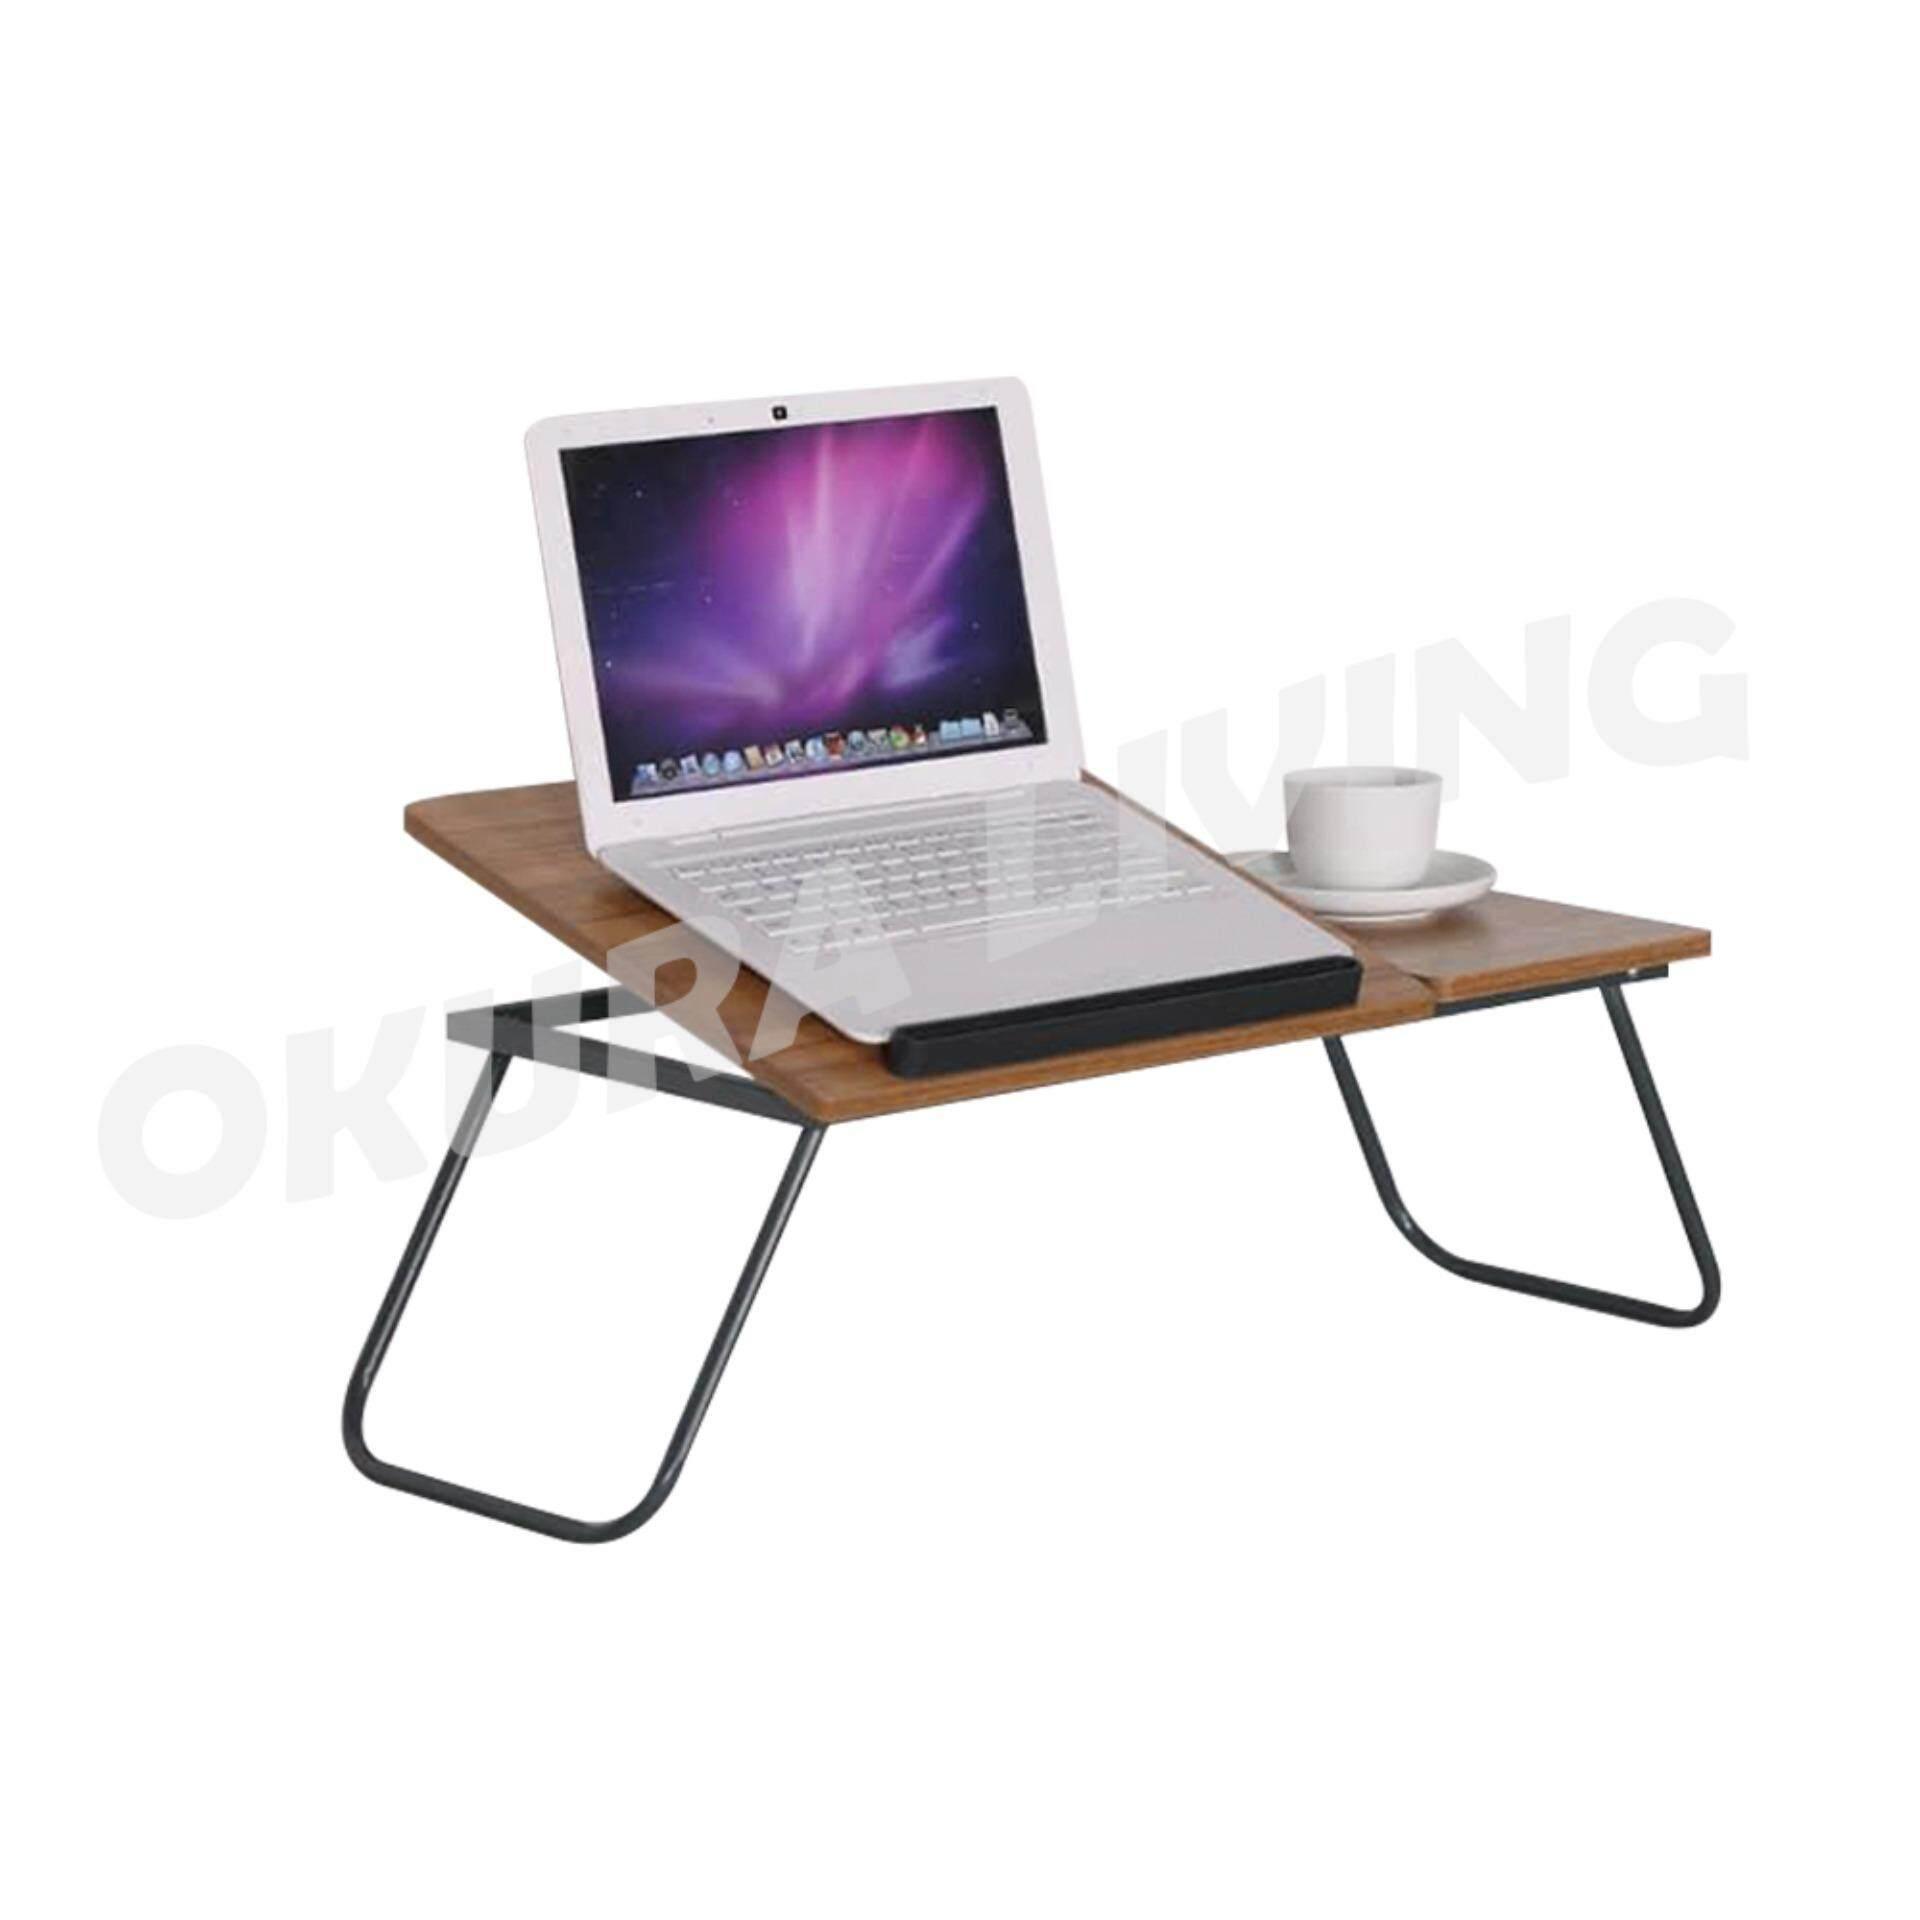 OKURA Foldable & Adjustable Laptop Desk Portable Folding Computer Table